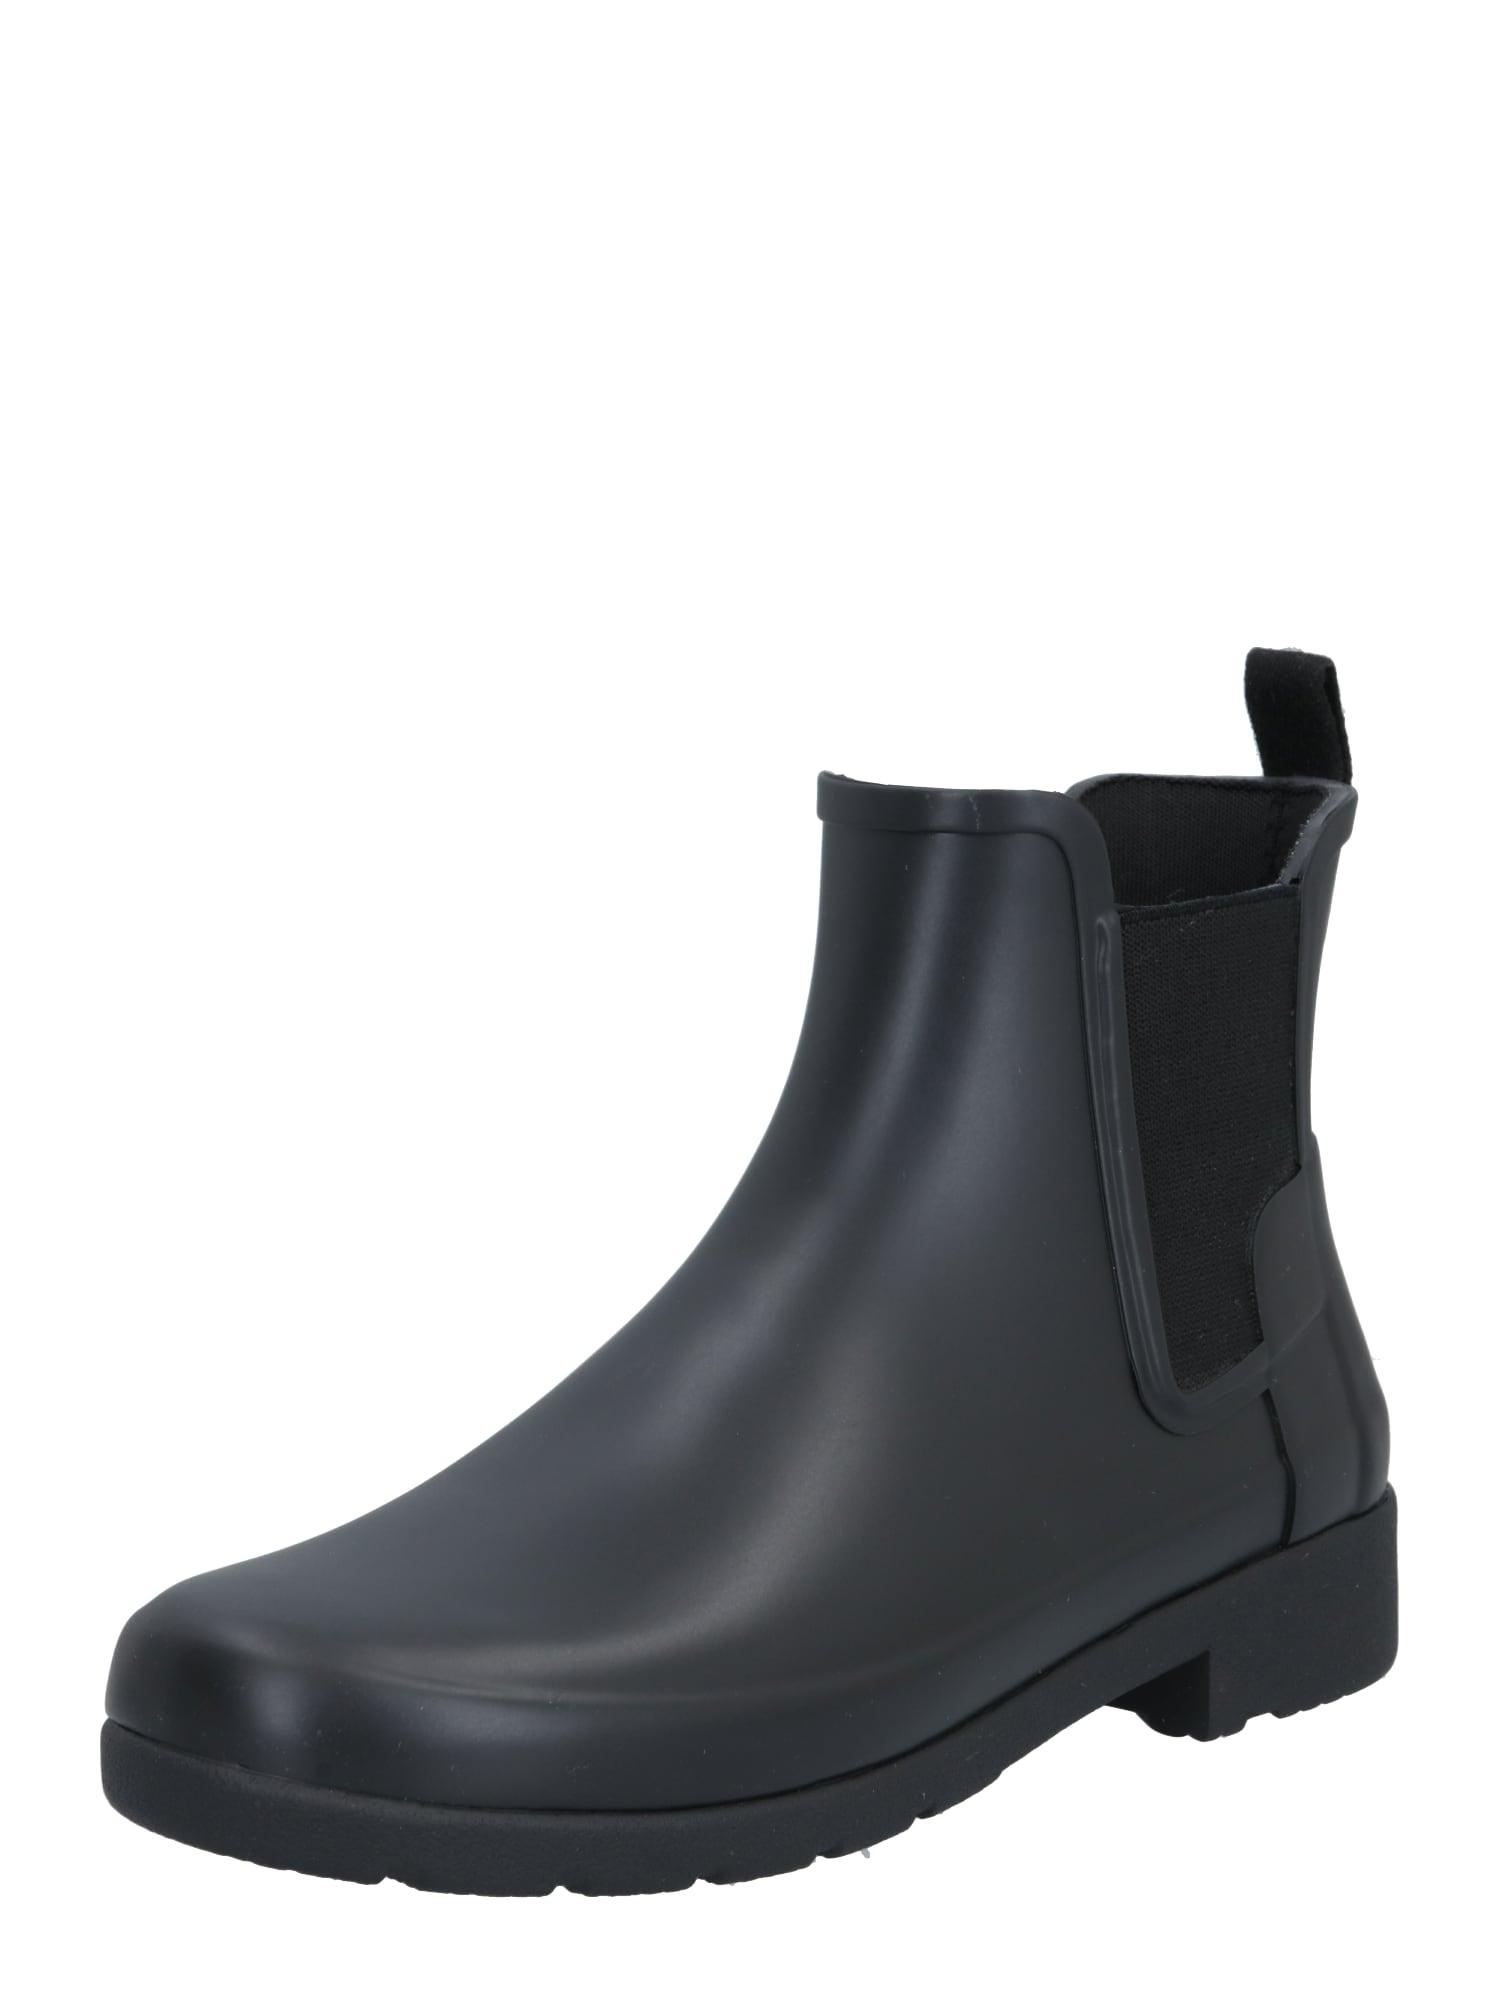 HUNTER Guminiai batai juoda